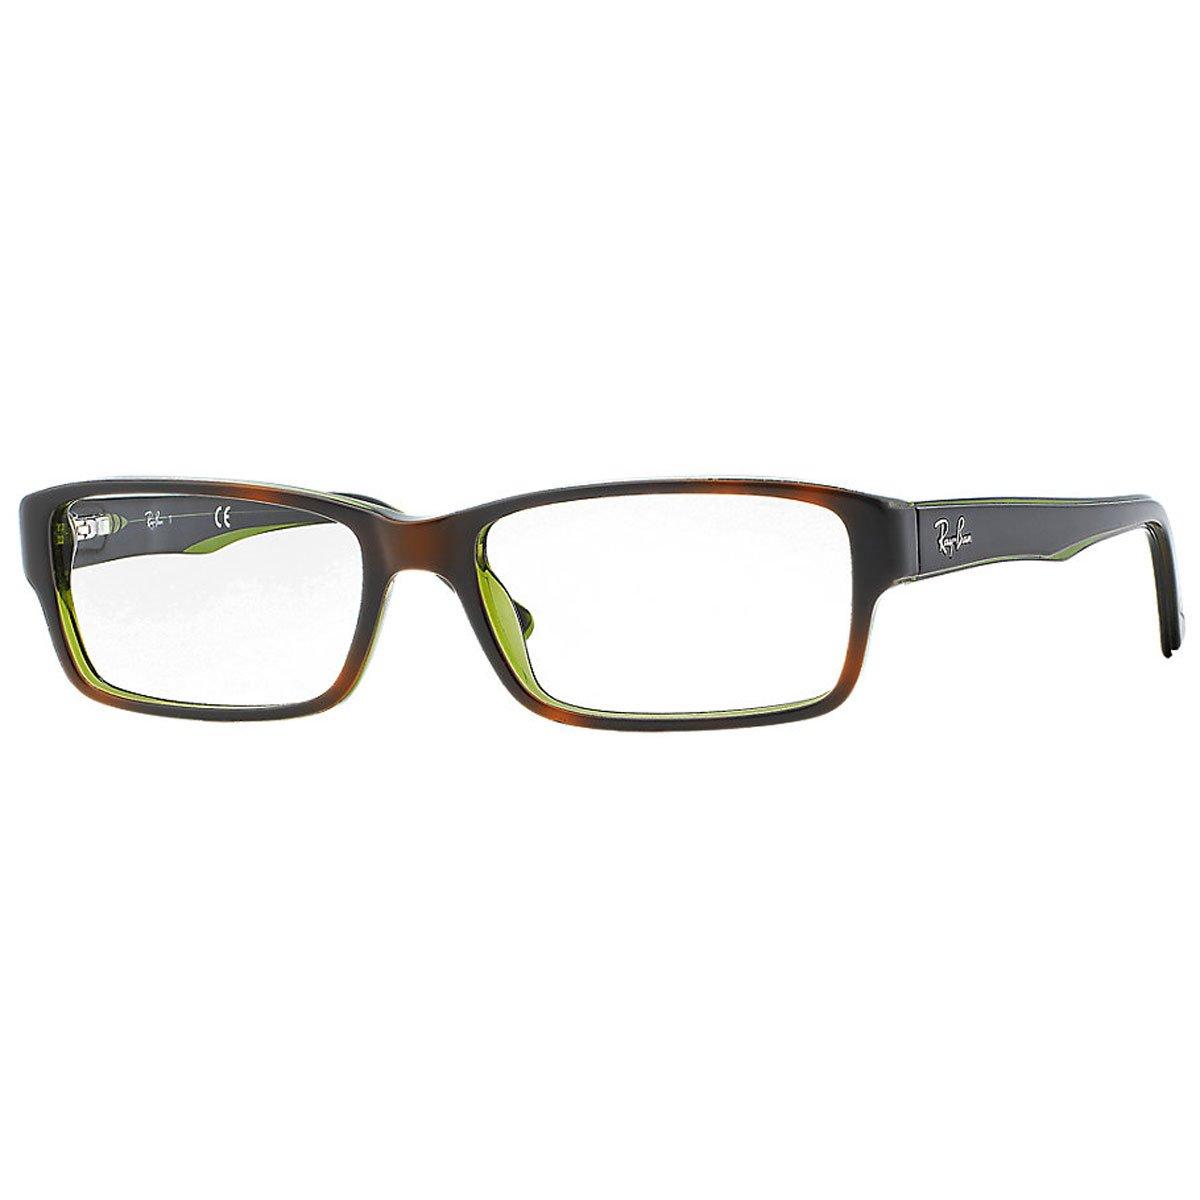 New Ray Ban RB RX 5169 2034 Black Crystal Frame Plastic Eyeglasses Ray-Ban